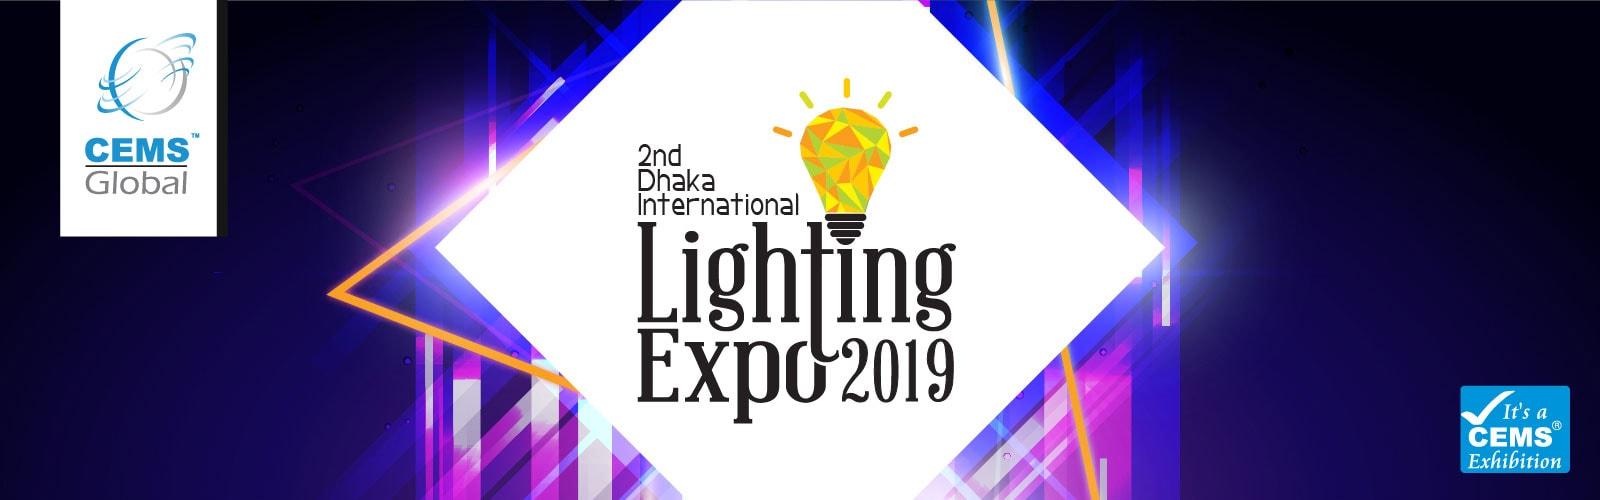 2nd Dhaka International Lighting Expo 2019